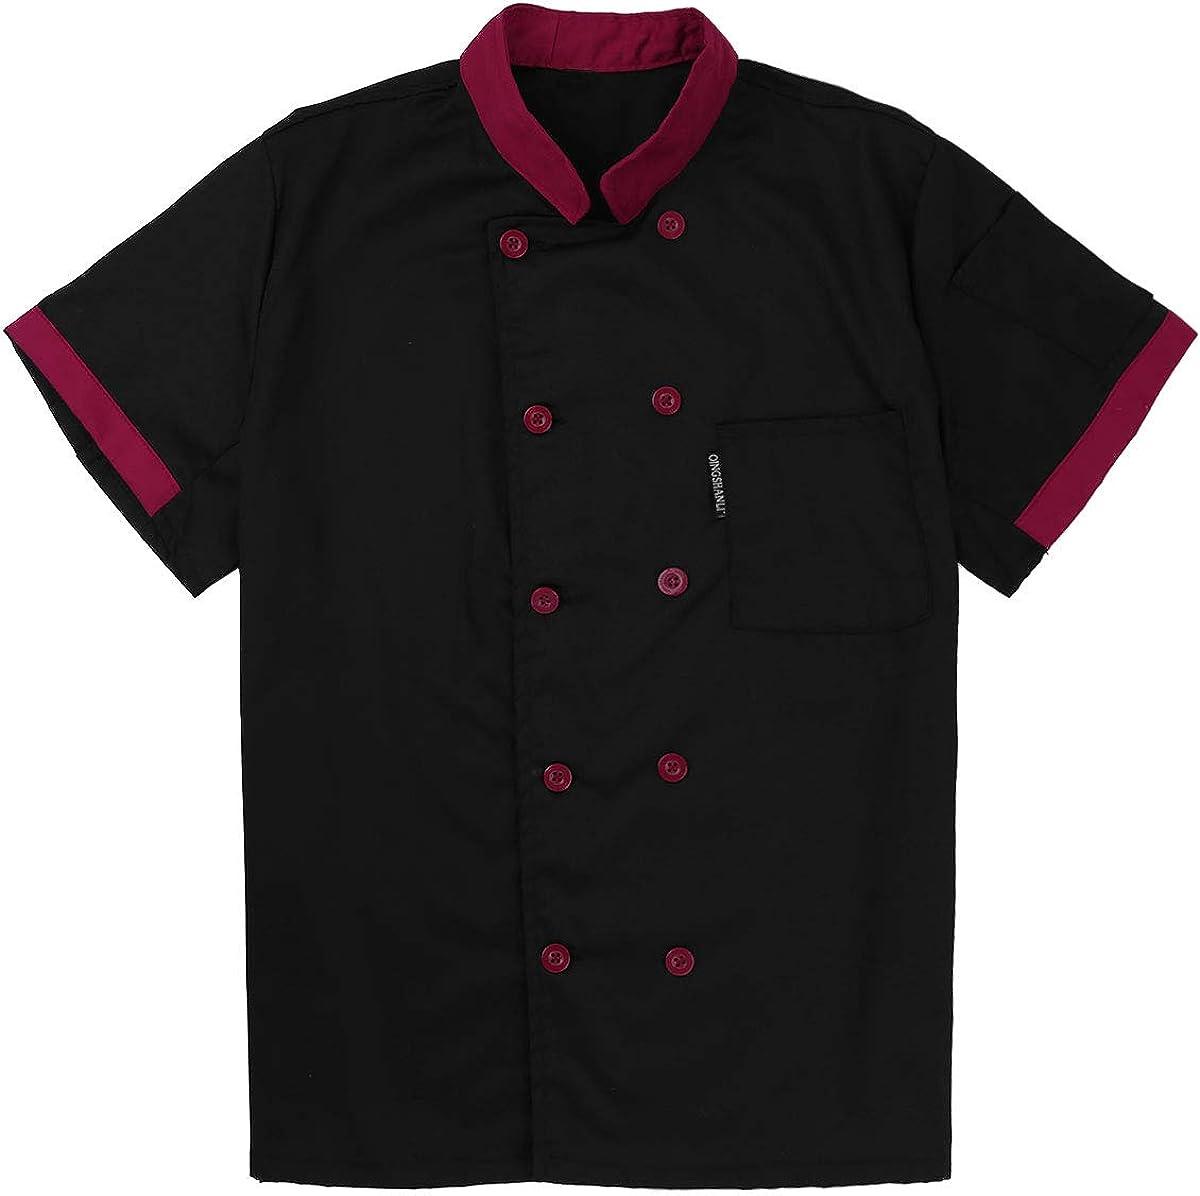 ACSUSS Unisex Men Women Short Sleeve Chef Jacket Coat Cooker Work Restaurant Uniforms